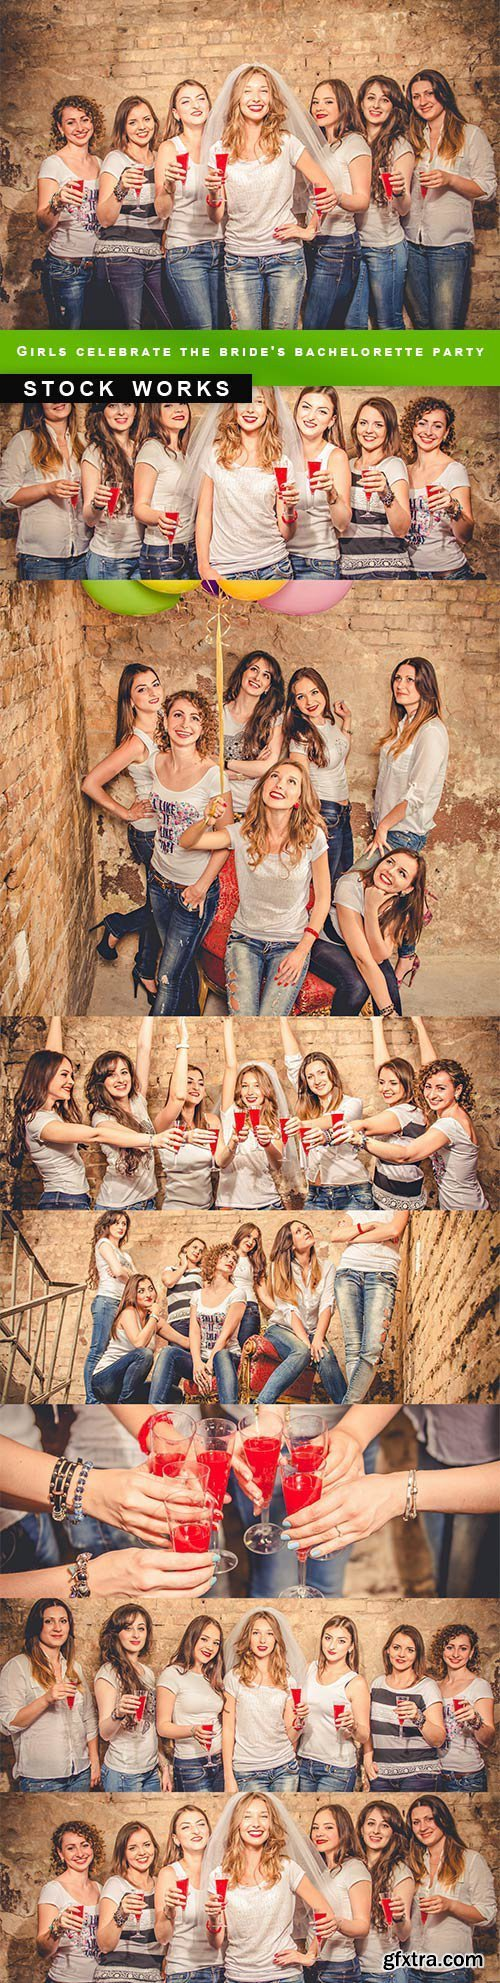 Girls celebrate the bride's bachelorette party